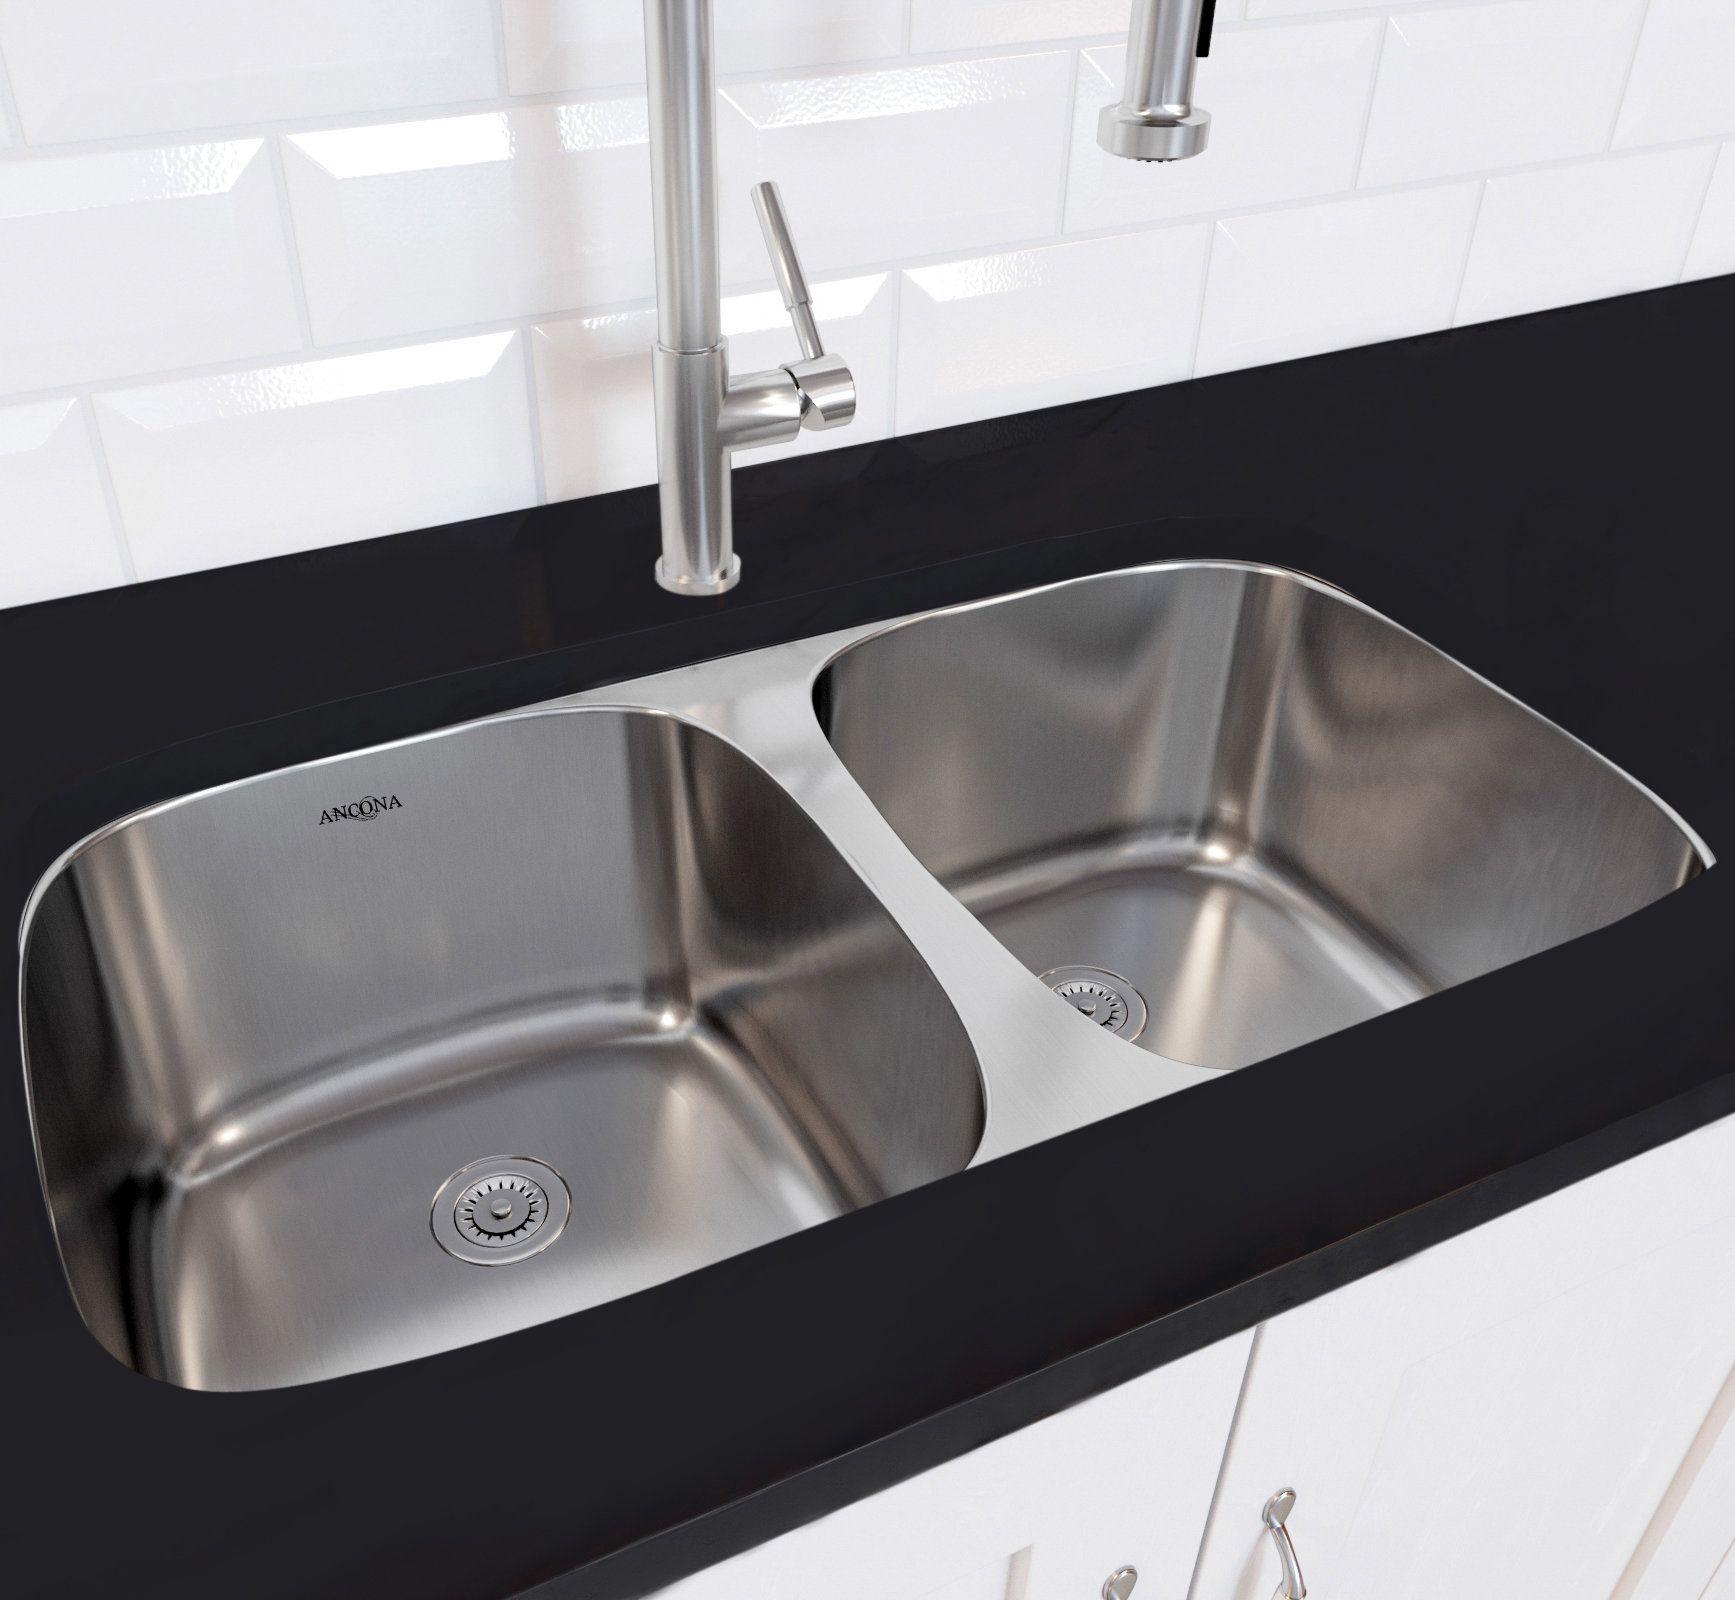 sterling 11444 plumbing kitchen sink faucets sink double rh pinterest com